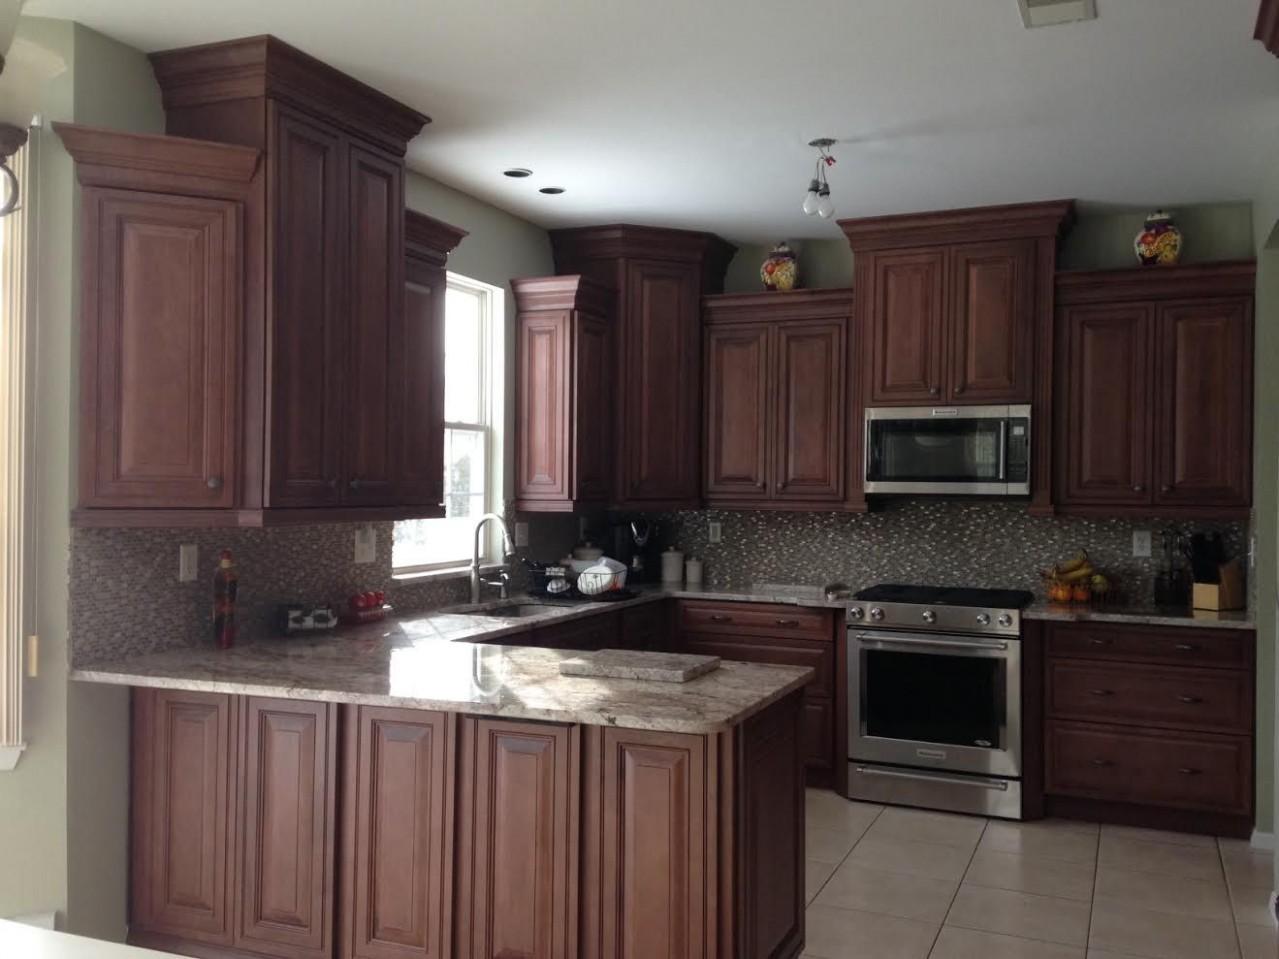 Decora Cinnabar in the Whillshire Door  Complete kitchens  - Red Bank Kitchen Cabinets